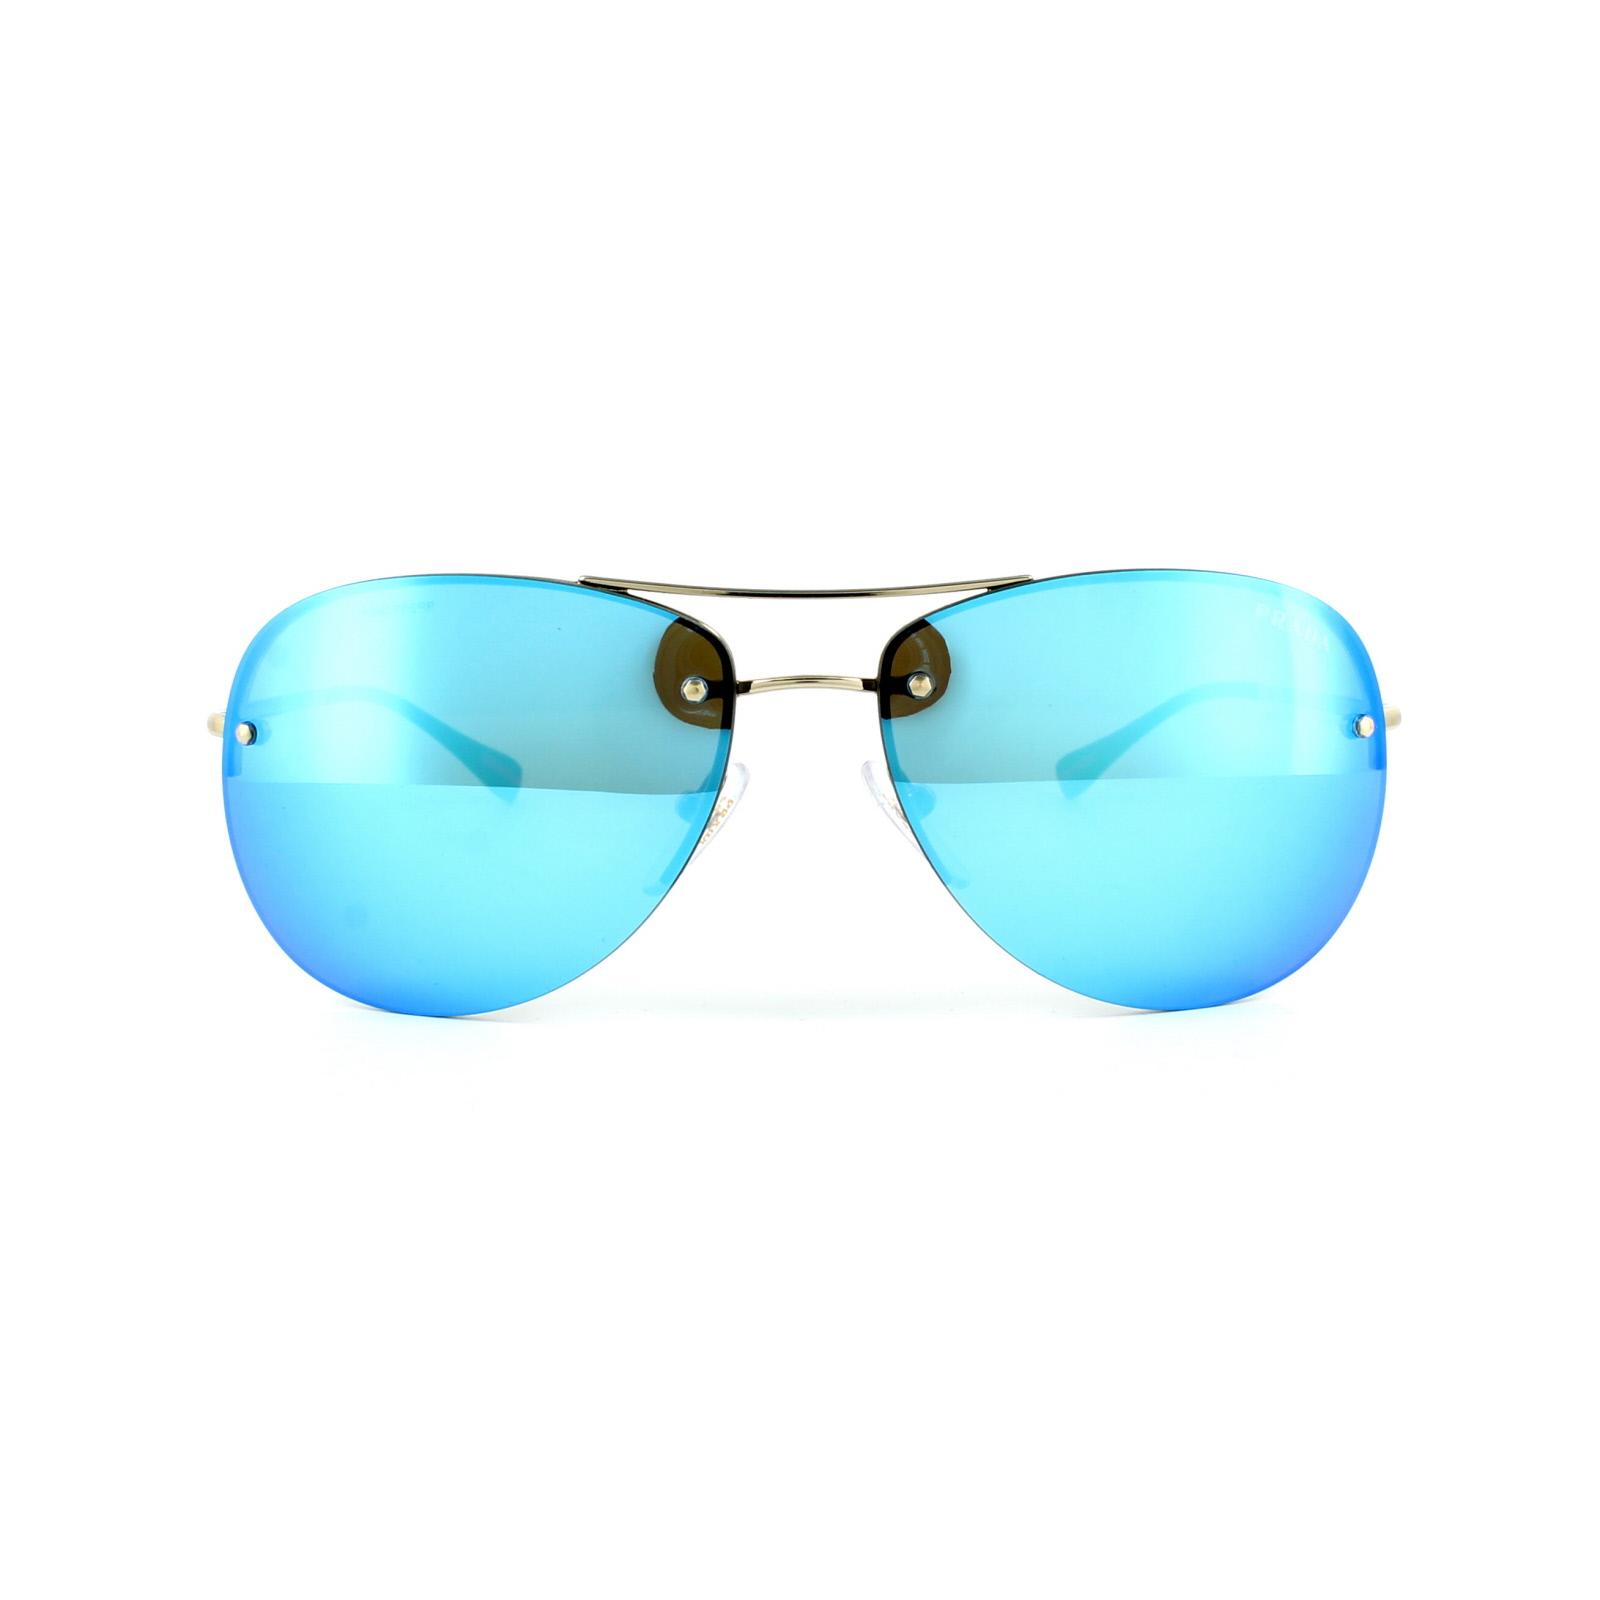 a9be036ed418f ... promo code for prada sport 50rs sunglasses thumbnail 1 prada sport 50rs  sunglasses thumbnail 2 93776